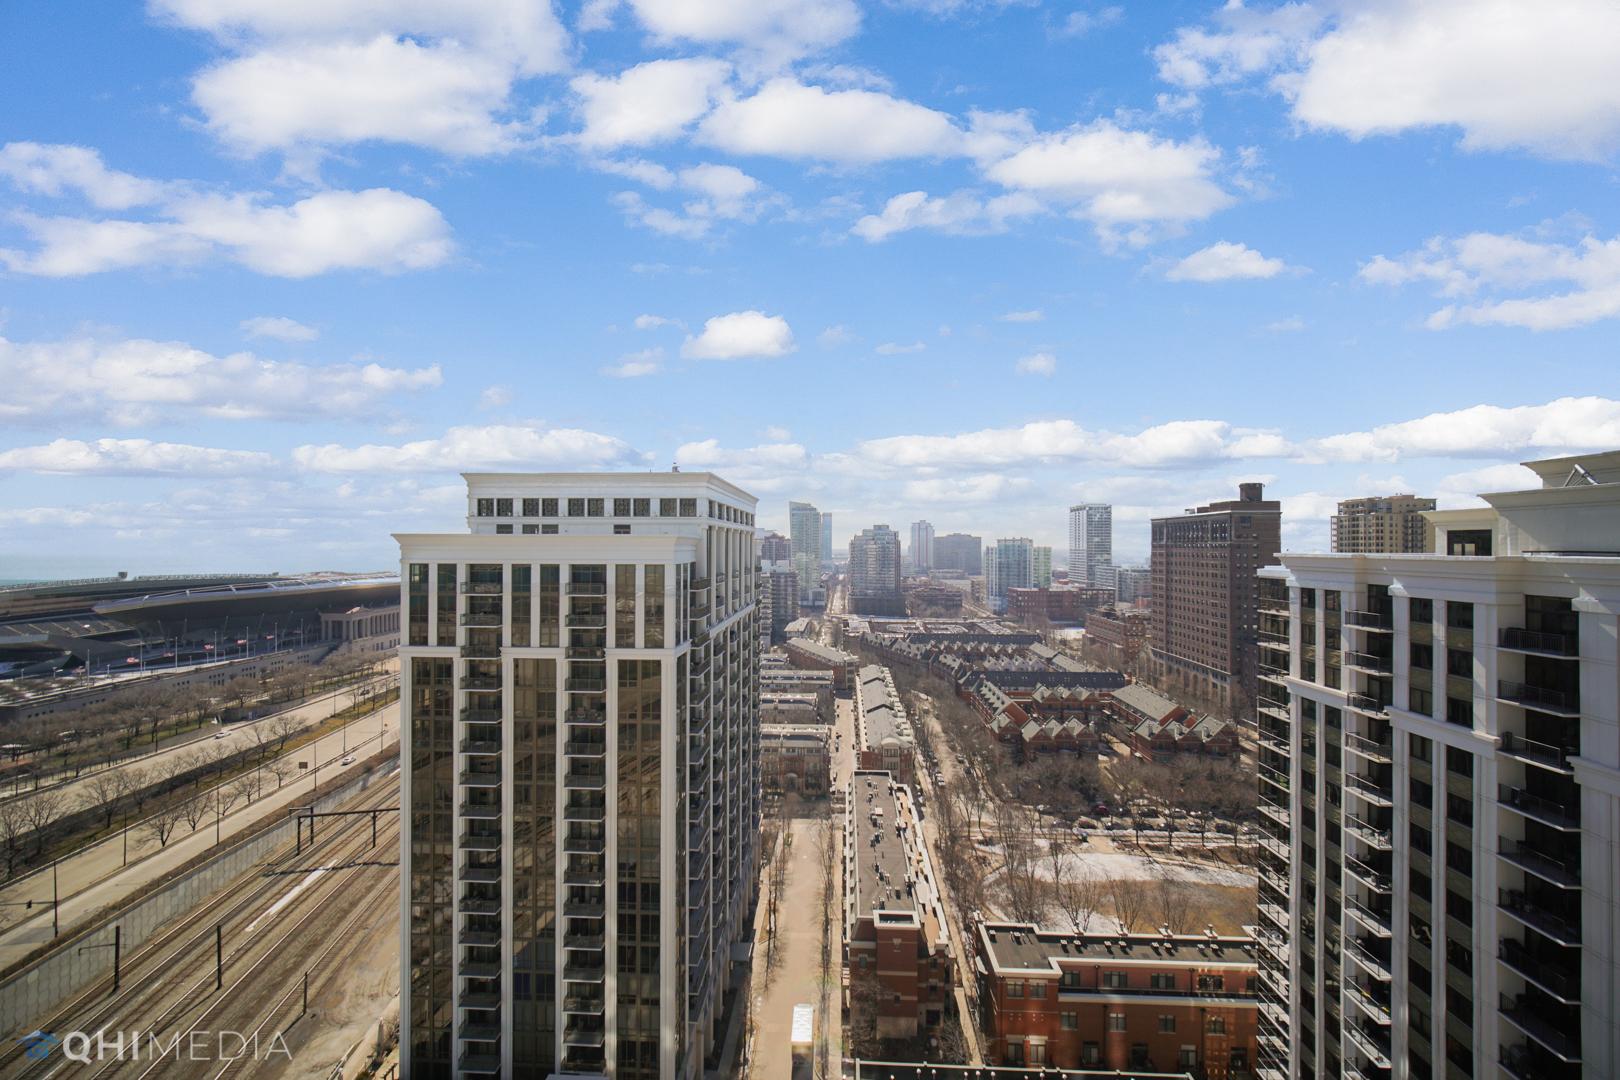 233 13th Unit Unit 2108 ,Chicago, Illinois 60605